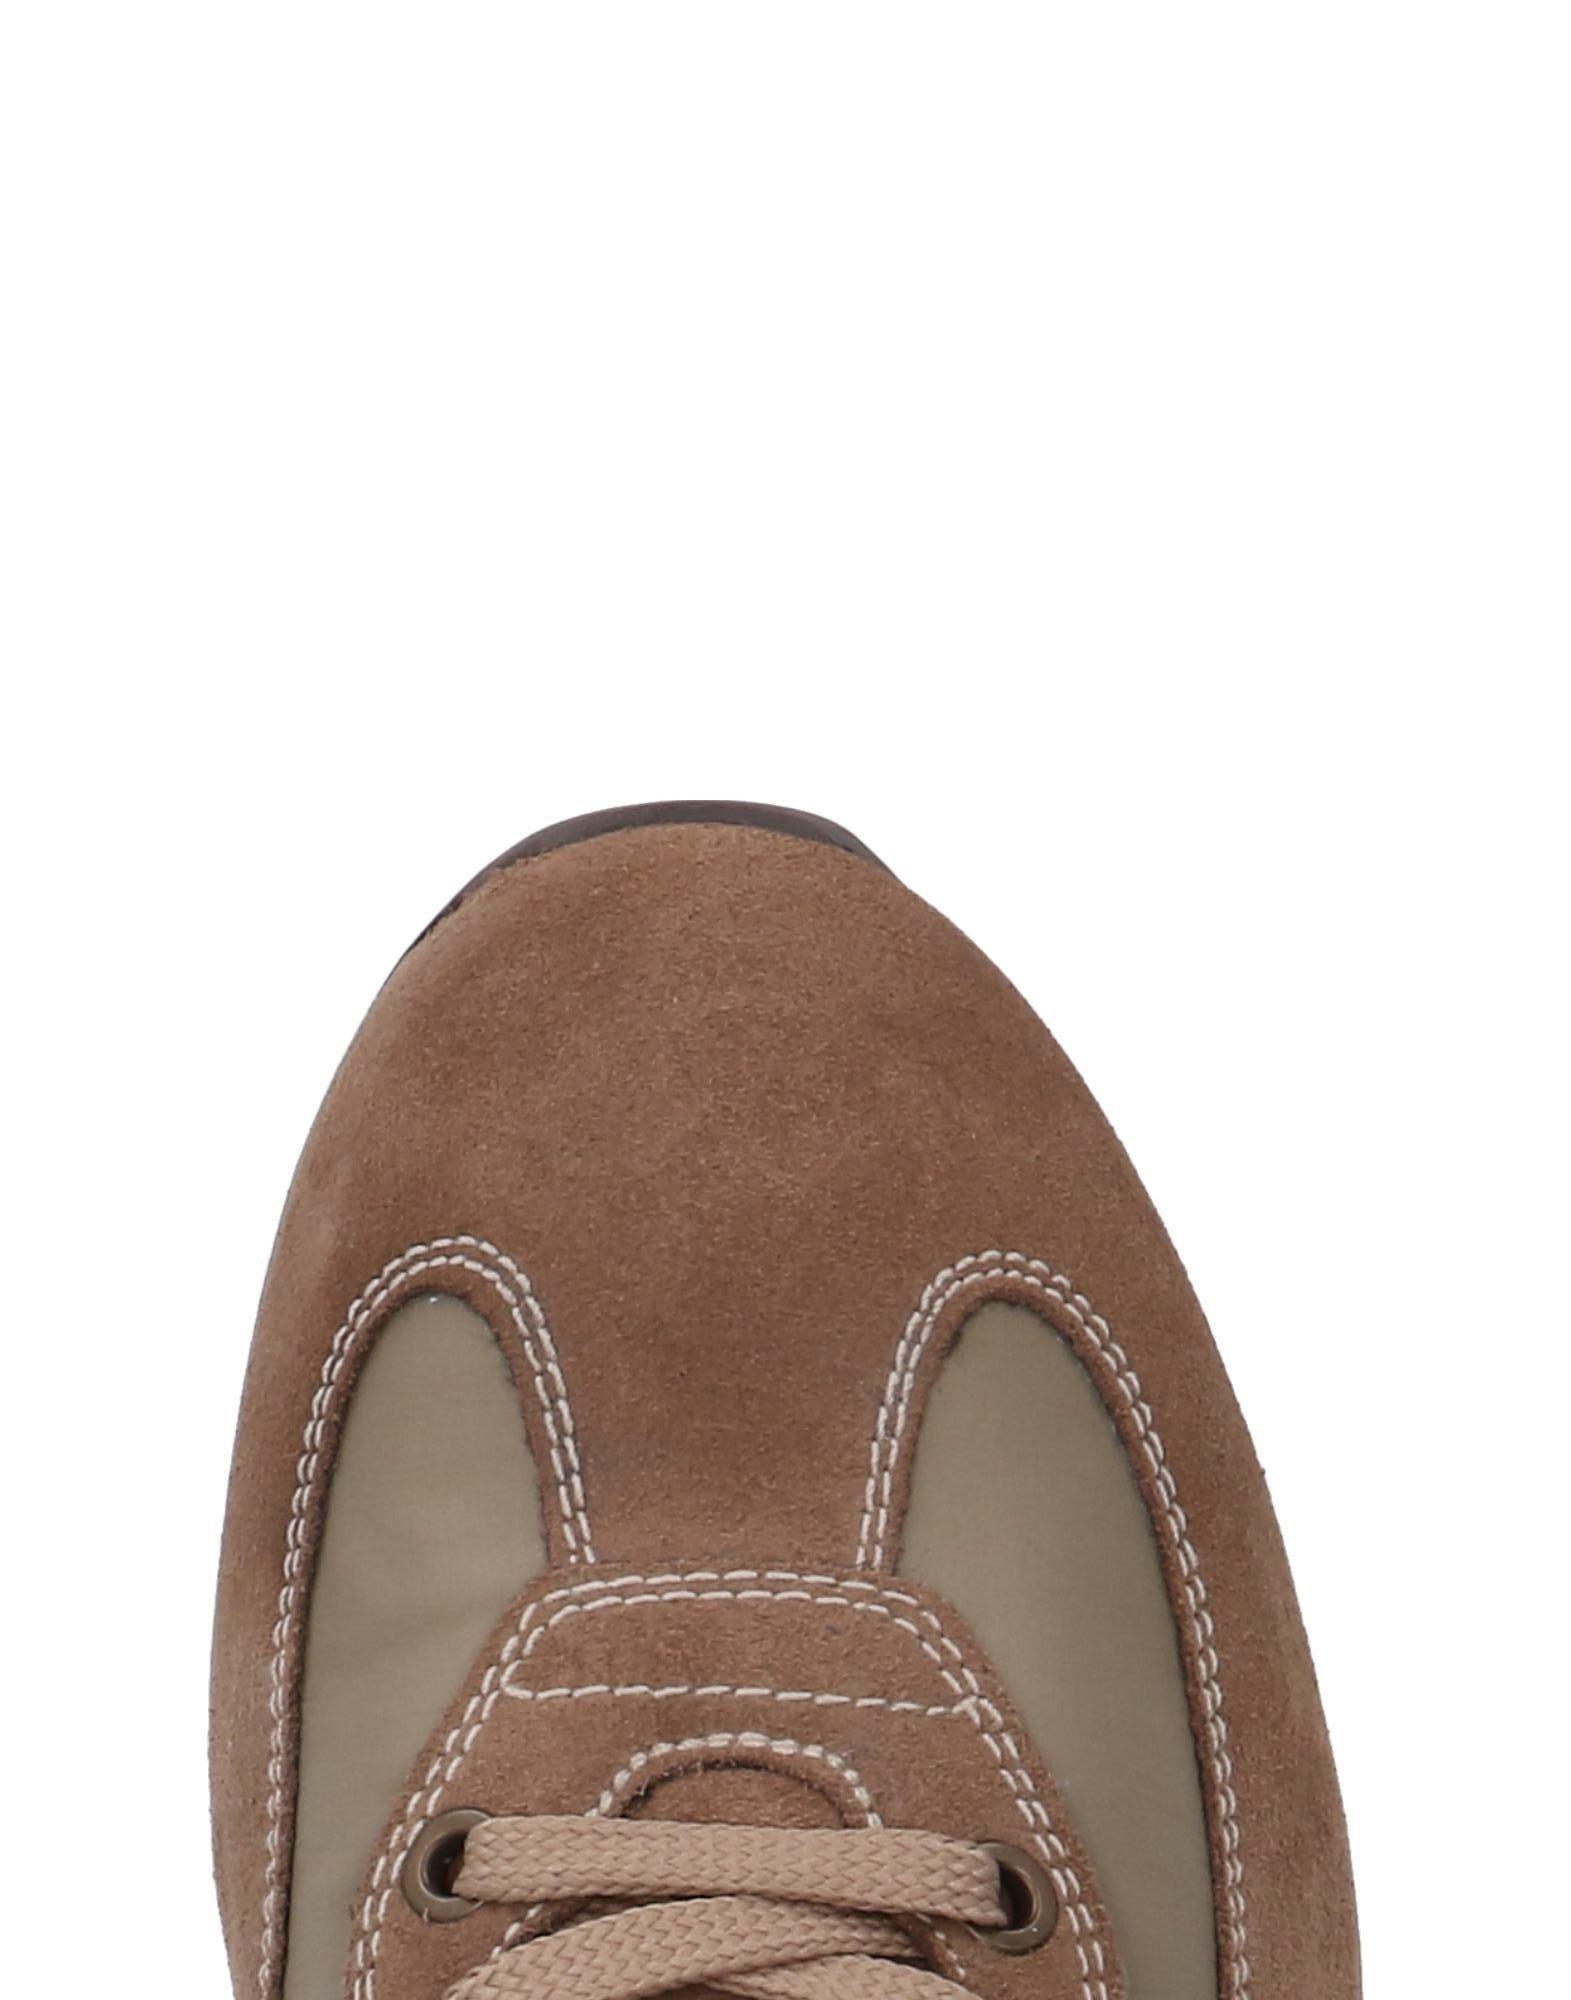 Rabatt Rabatt Rabatt echte Schuhe Nero Giardini Turnschuhes Herren 11499992IR aa7dda